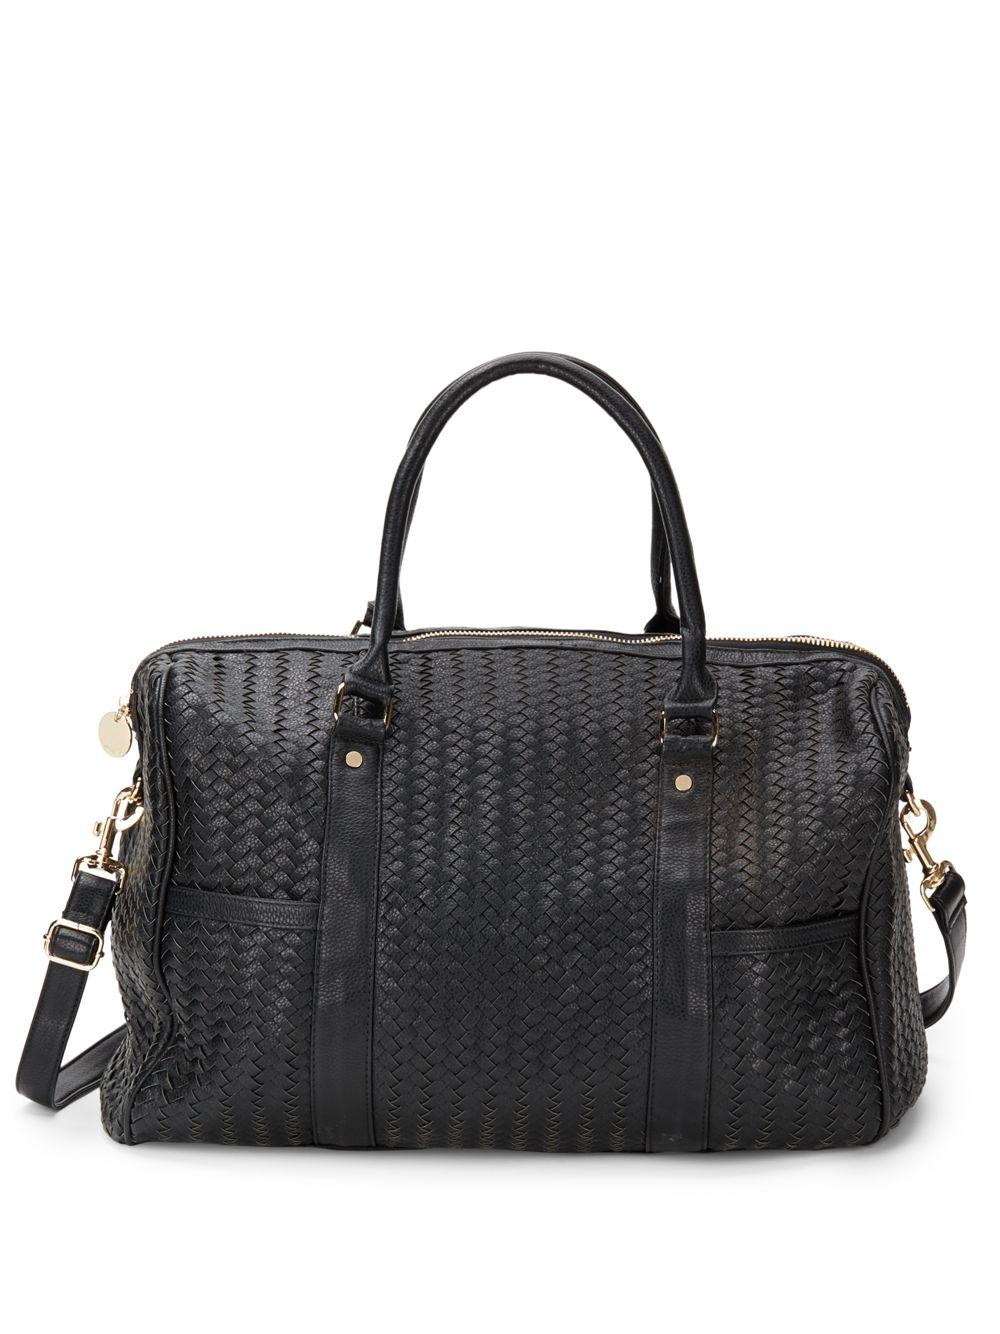 Deux Lux Gramercy Woven Weekender Bag In Black Lyst